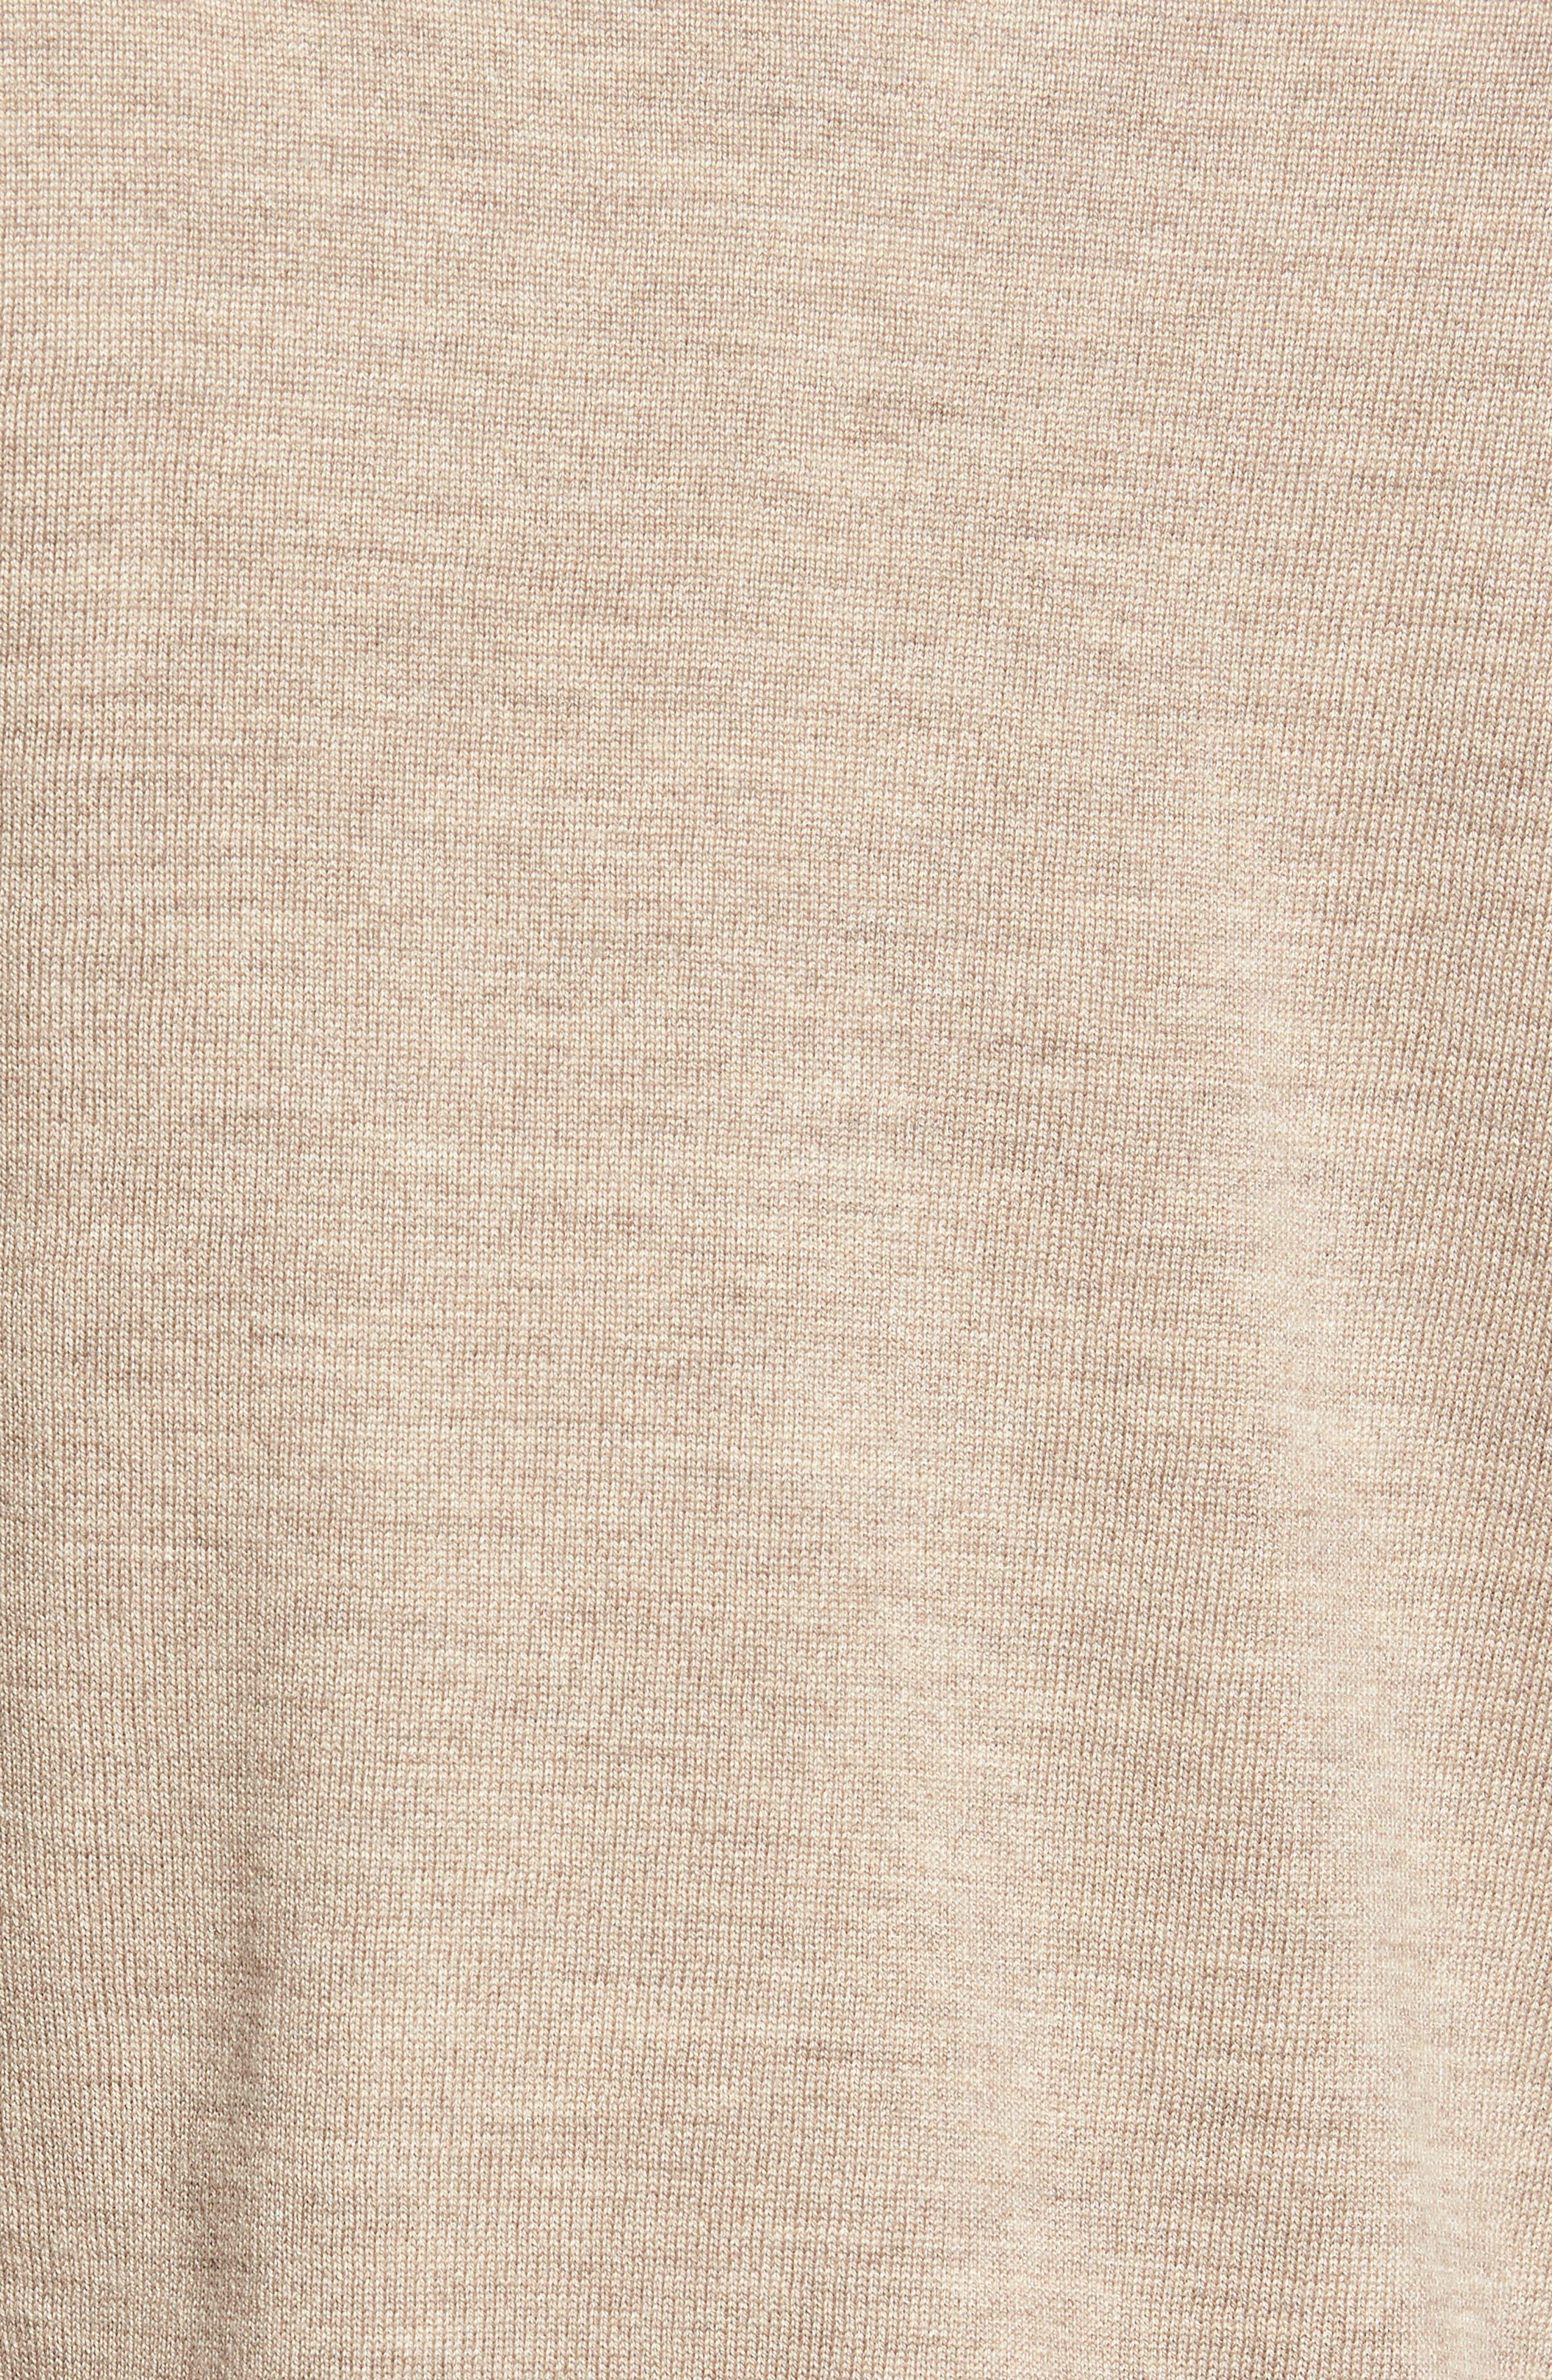 Merino Sweater,                             Alternate thumbnail 5, color,                             199